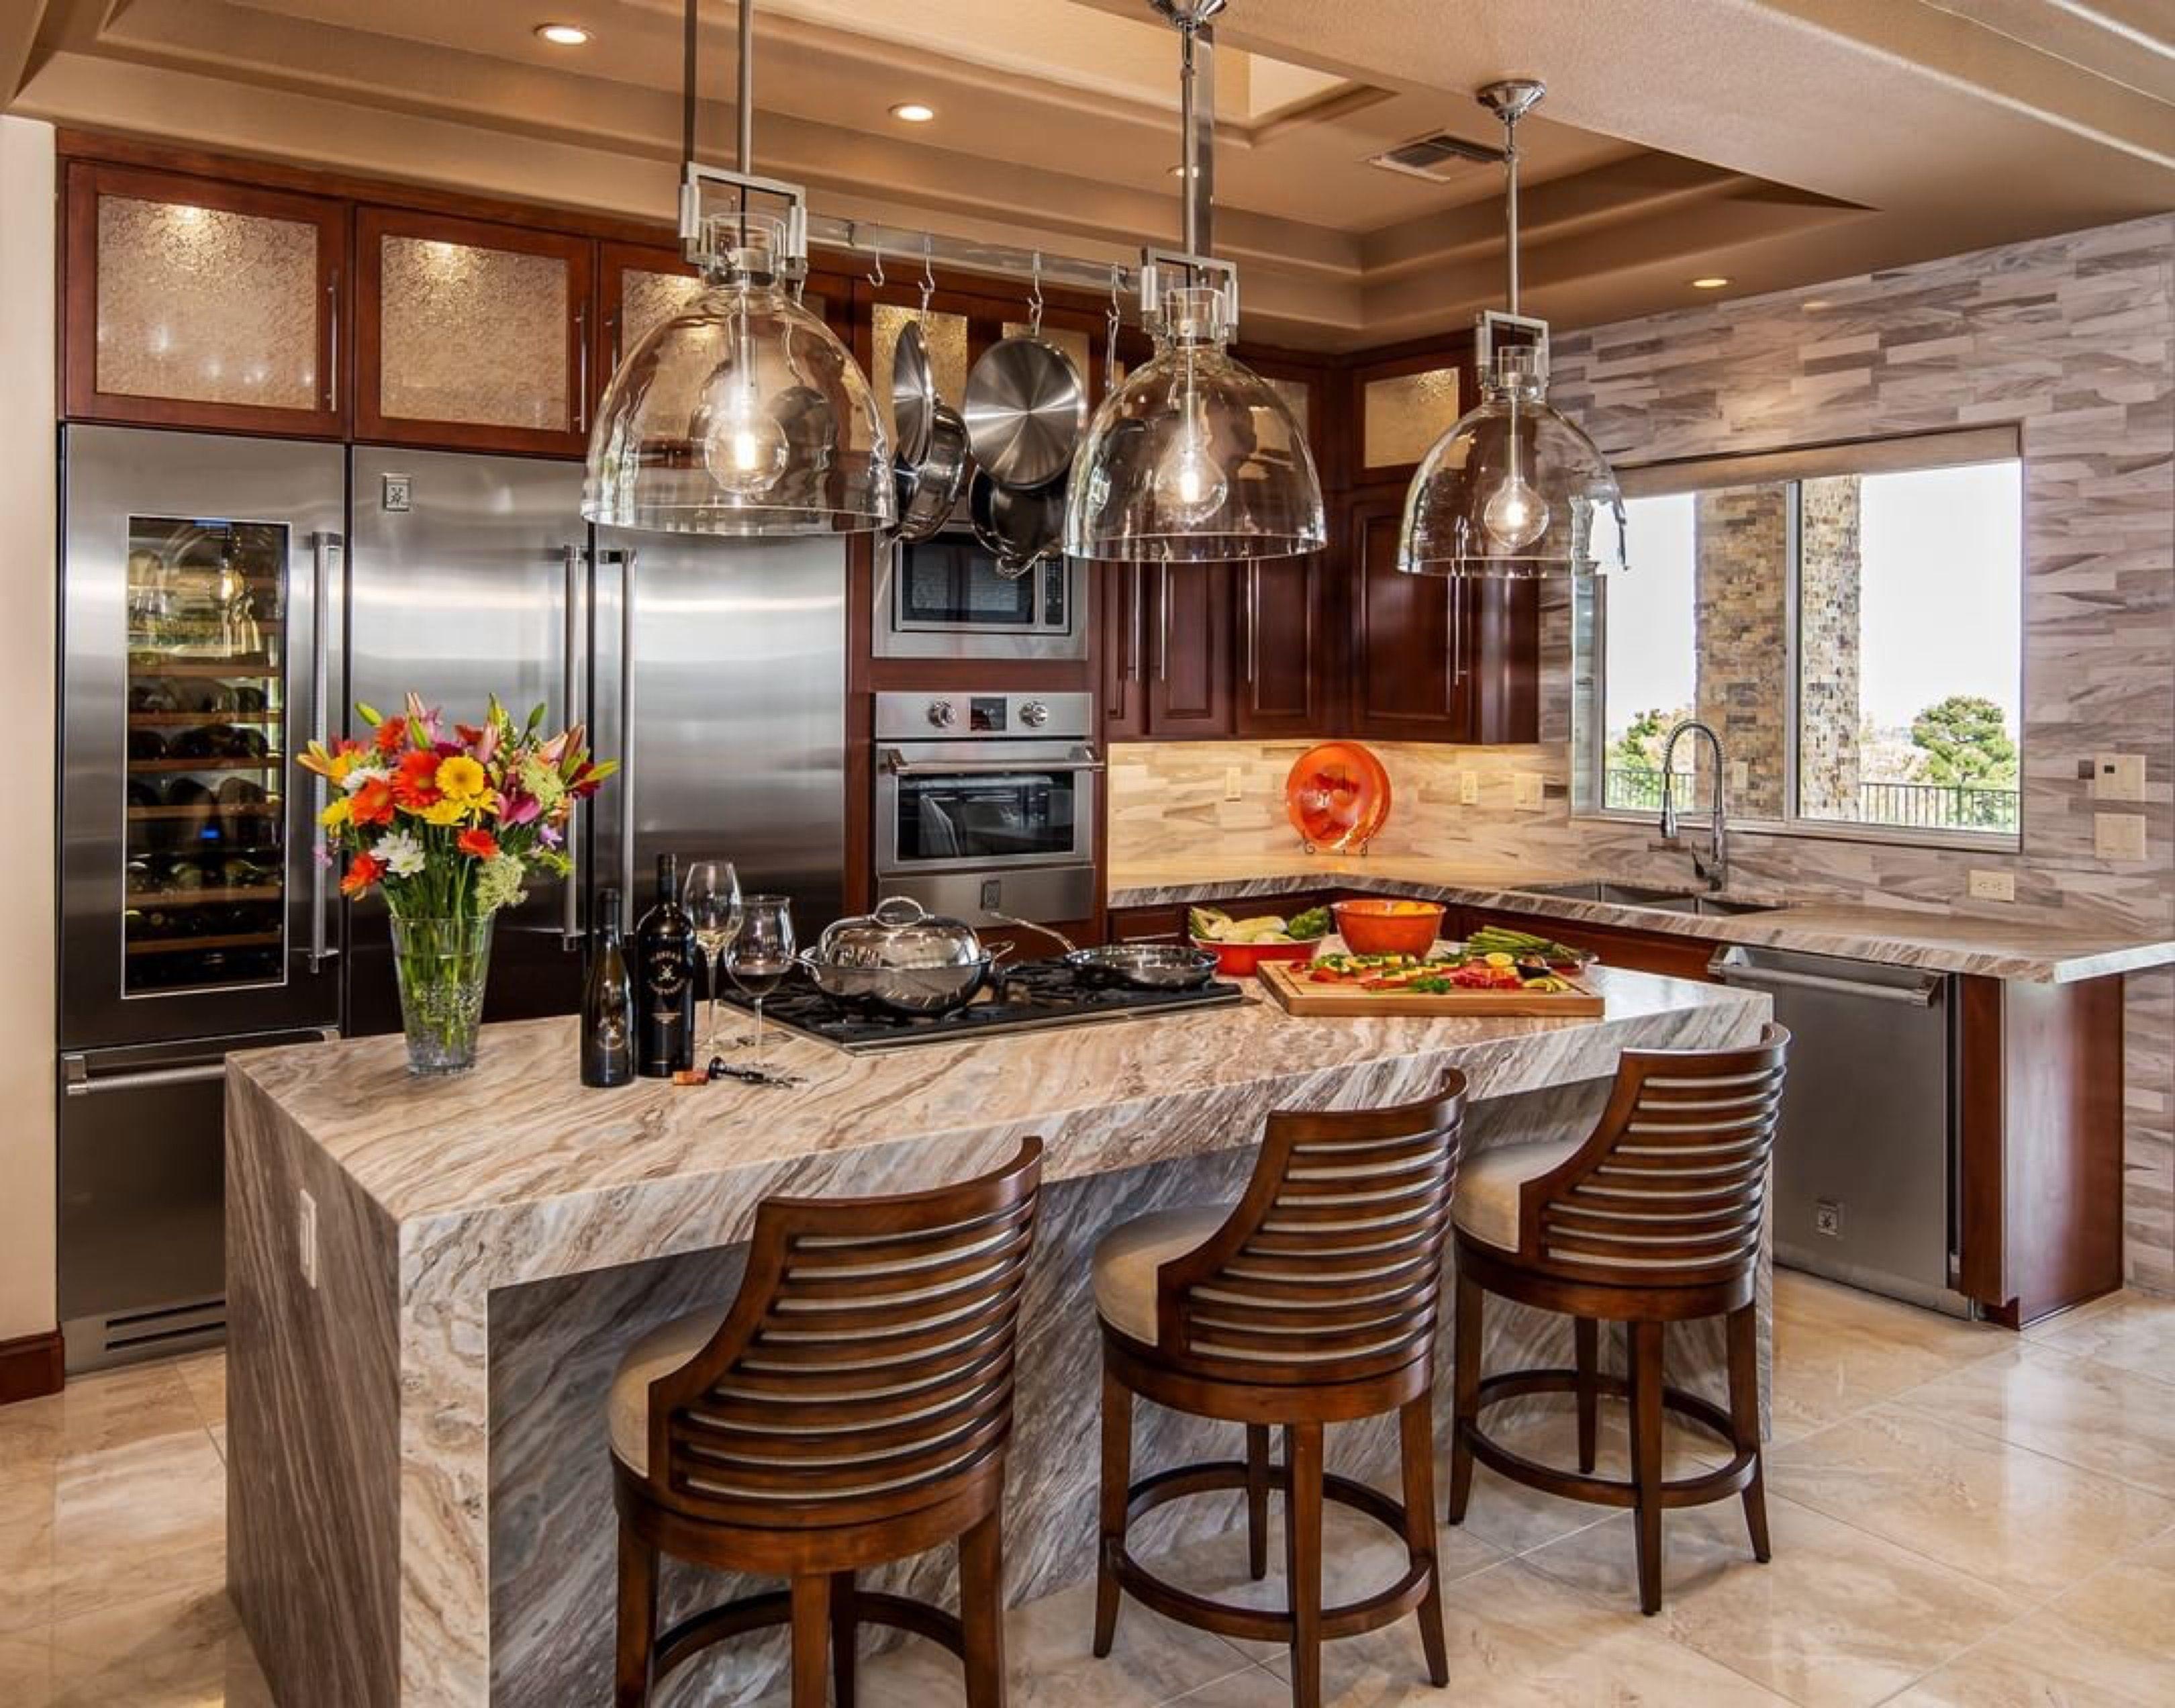 Home home kitchens professional kitchen commercial kitchen